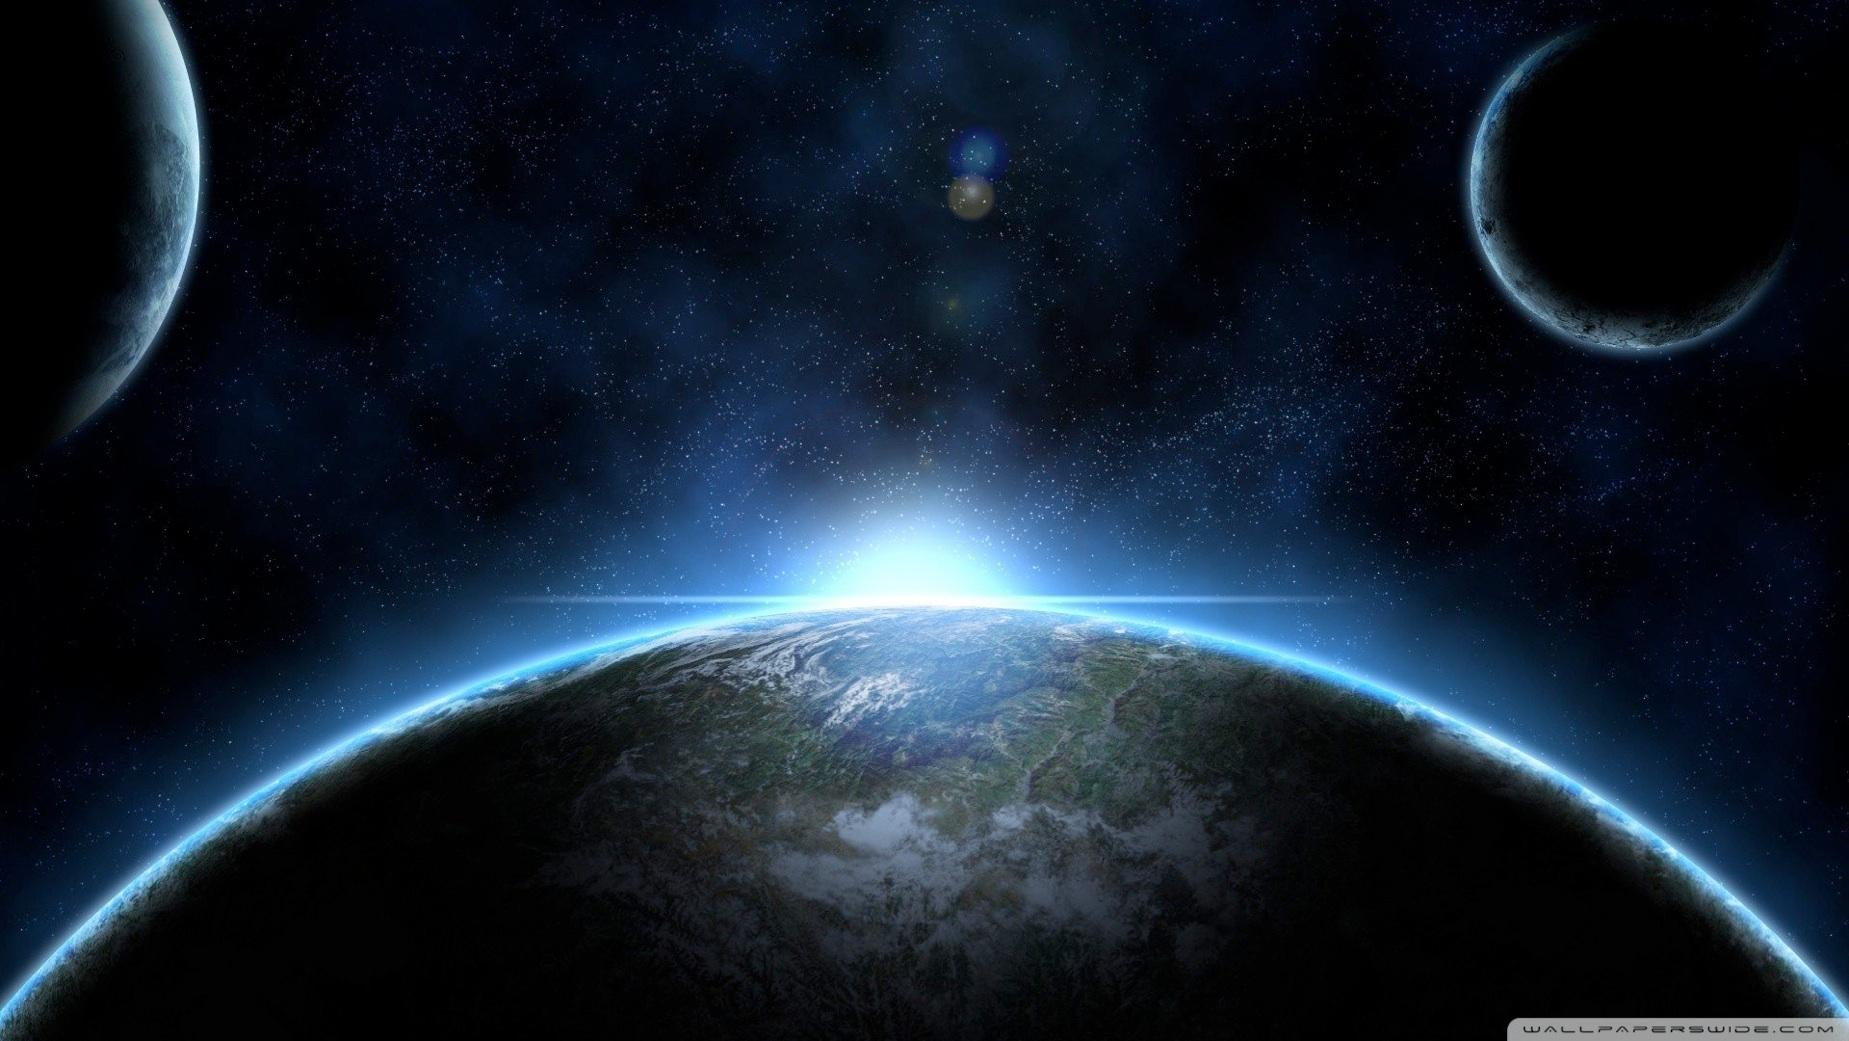 UFO Crashing Releases Orb - California